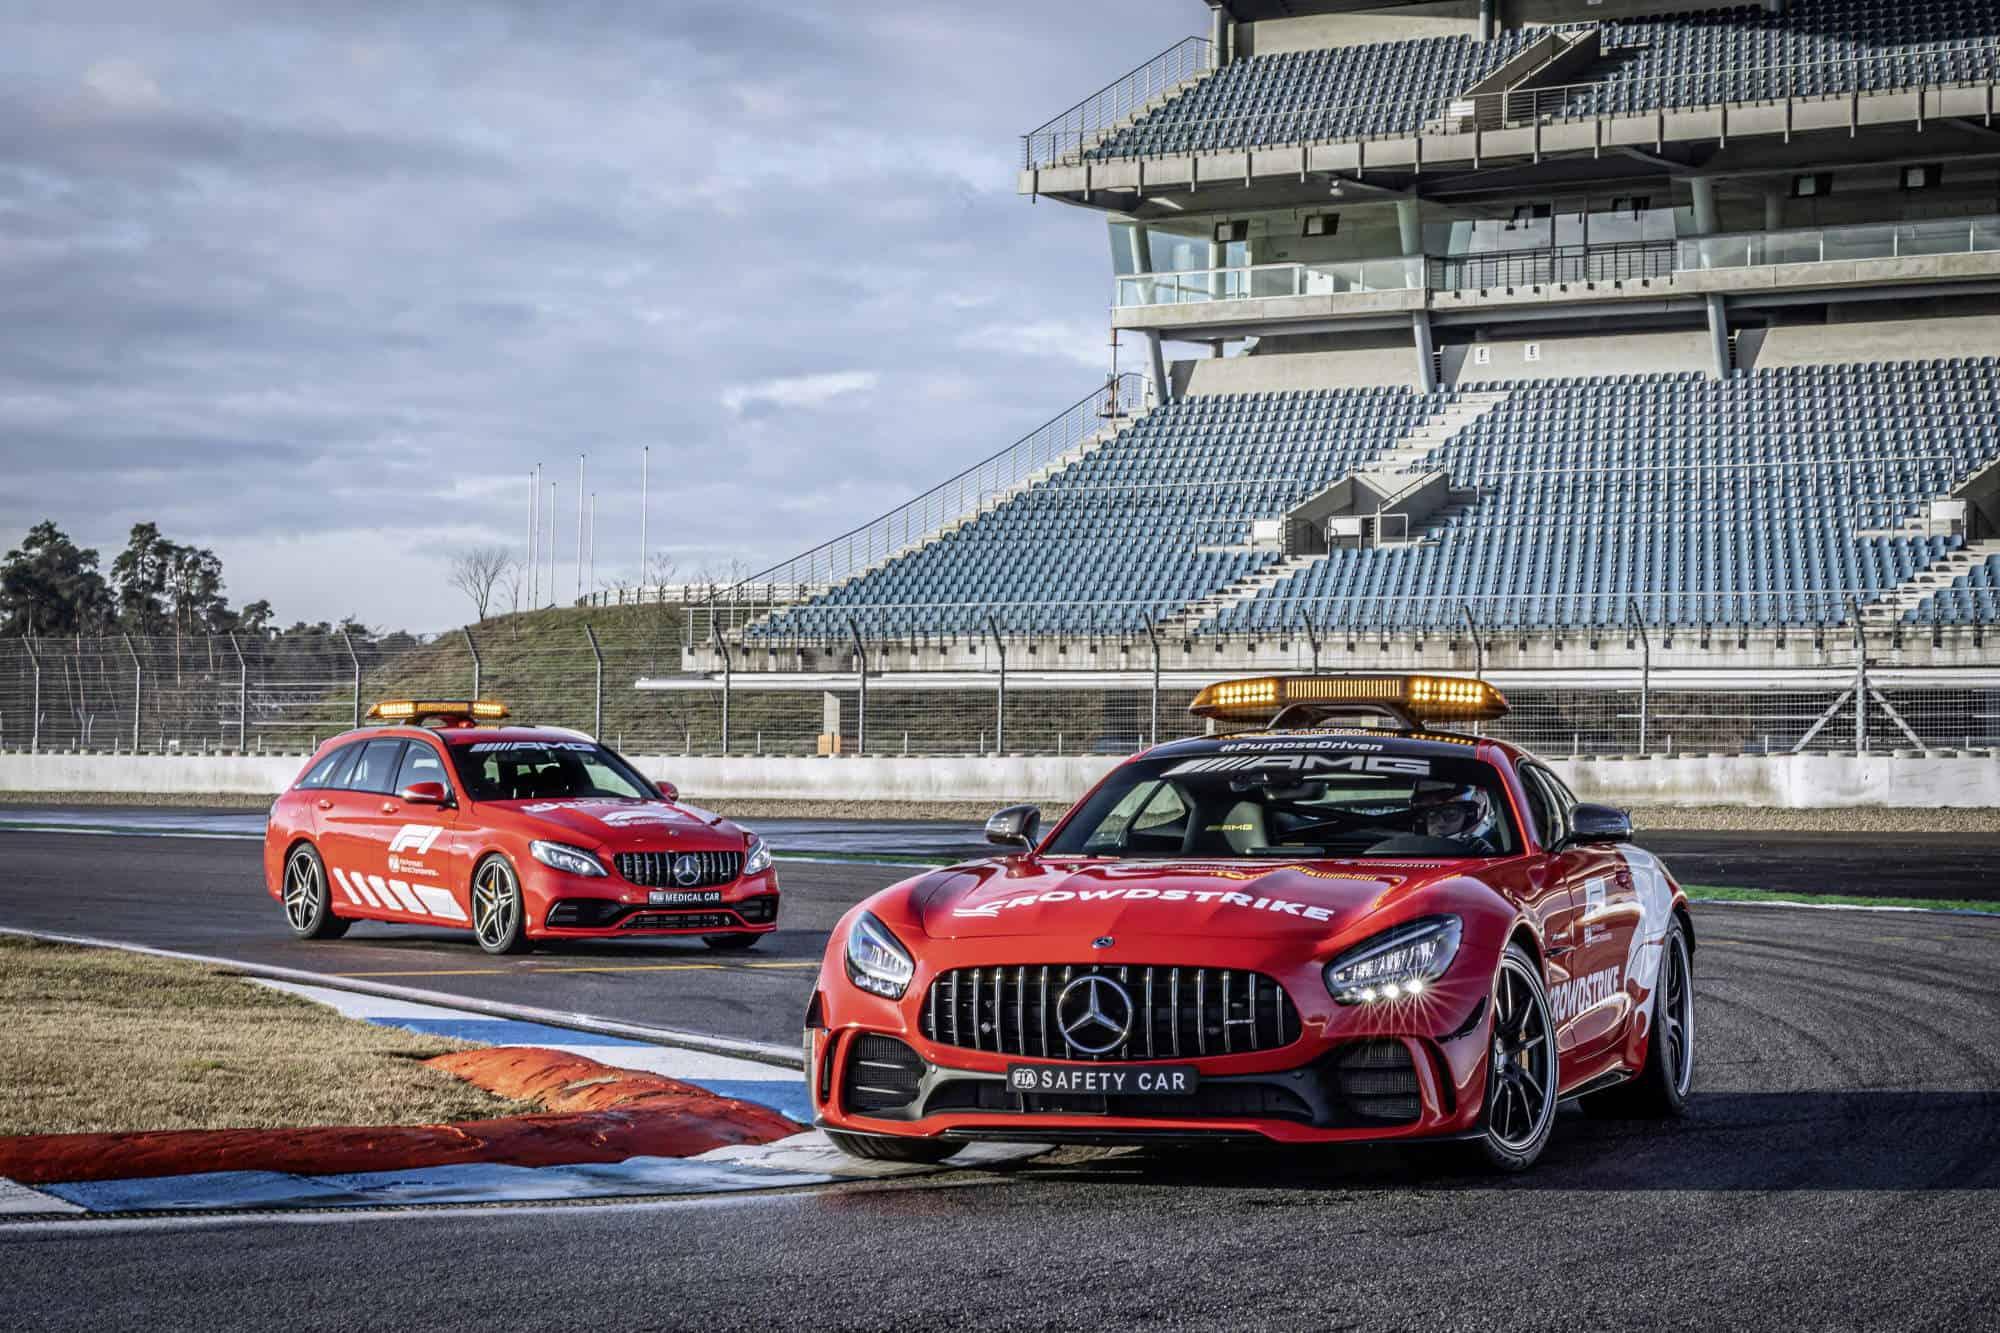 2021 Mercedes safety and medical car Photo Daimler